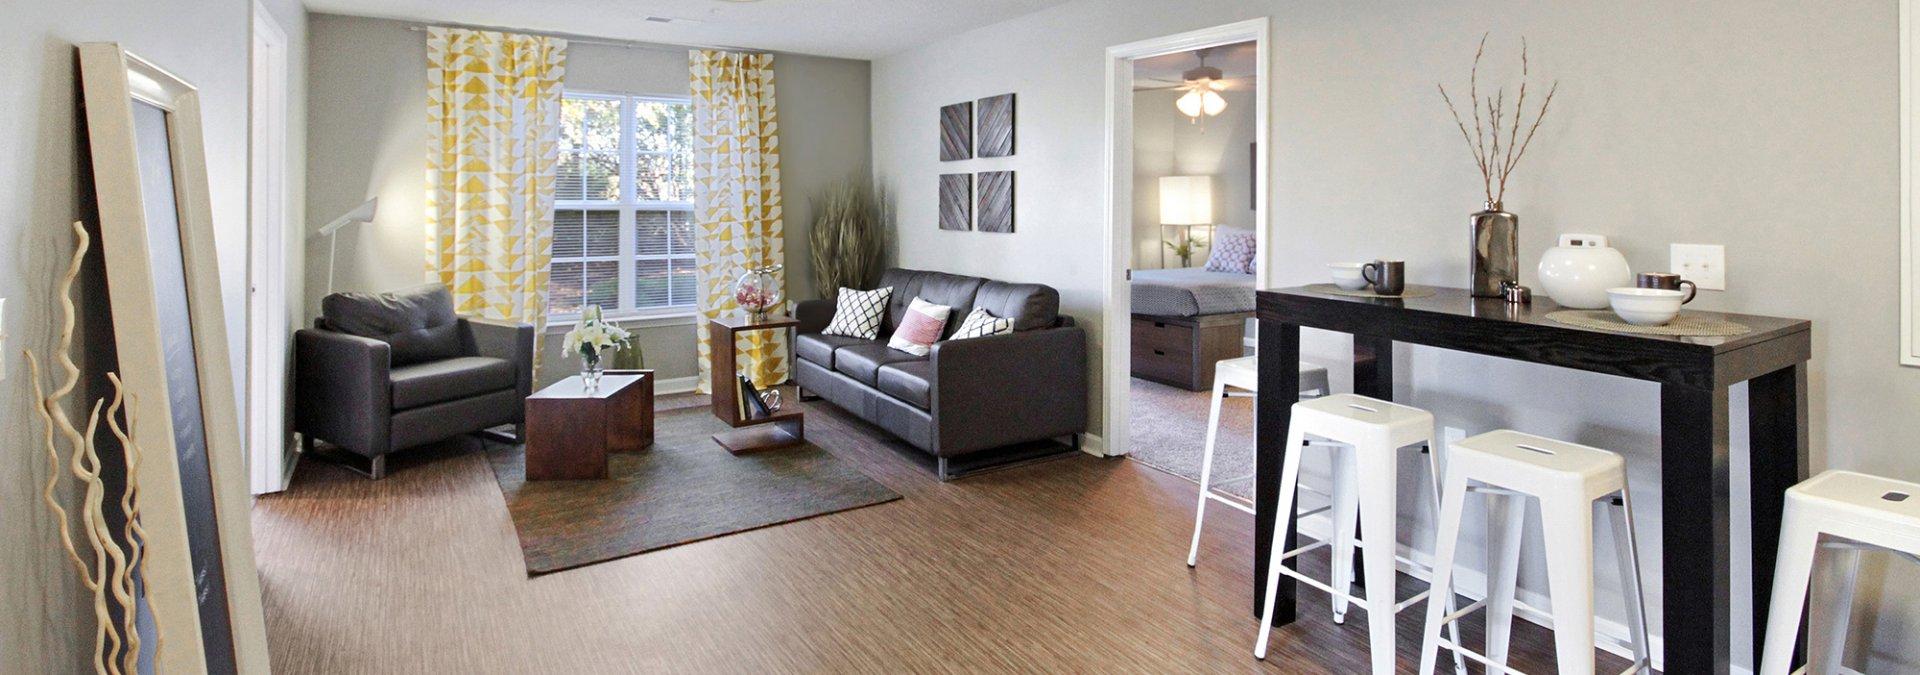 Apartments For Rent In Auburn AL | The Social at Aurburn 1